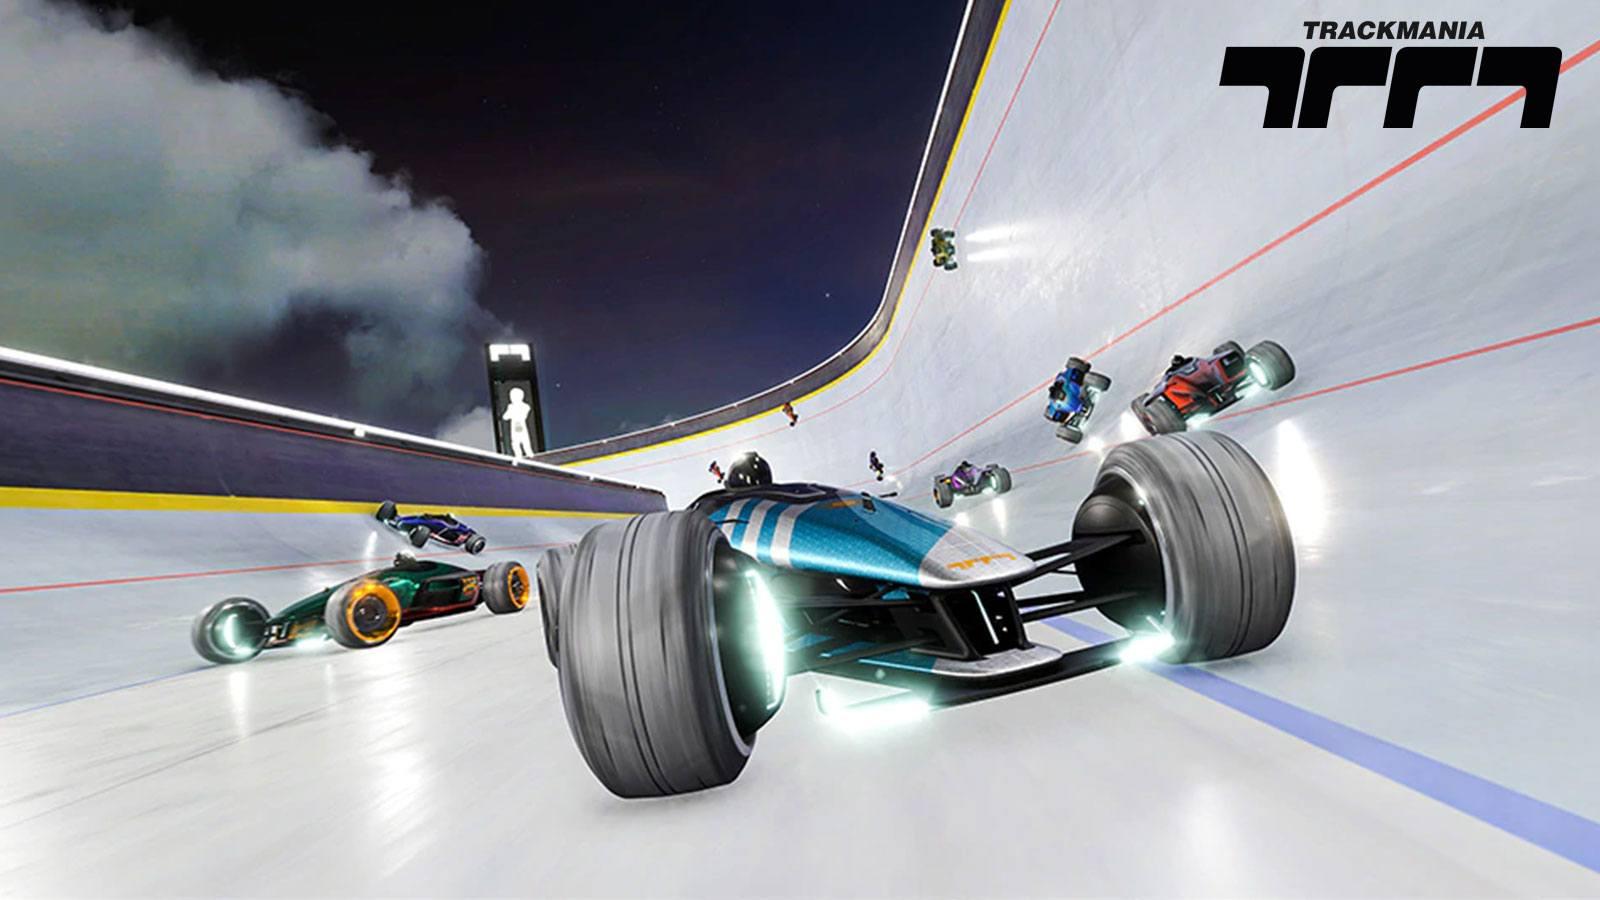 Trackmania Nadeo Ubisoft